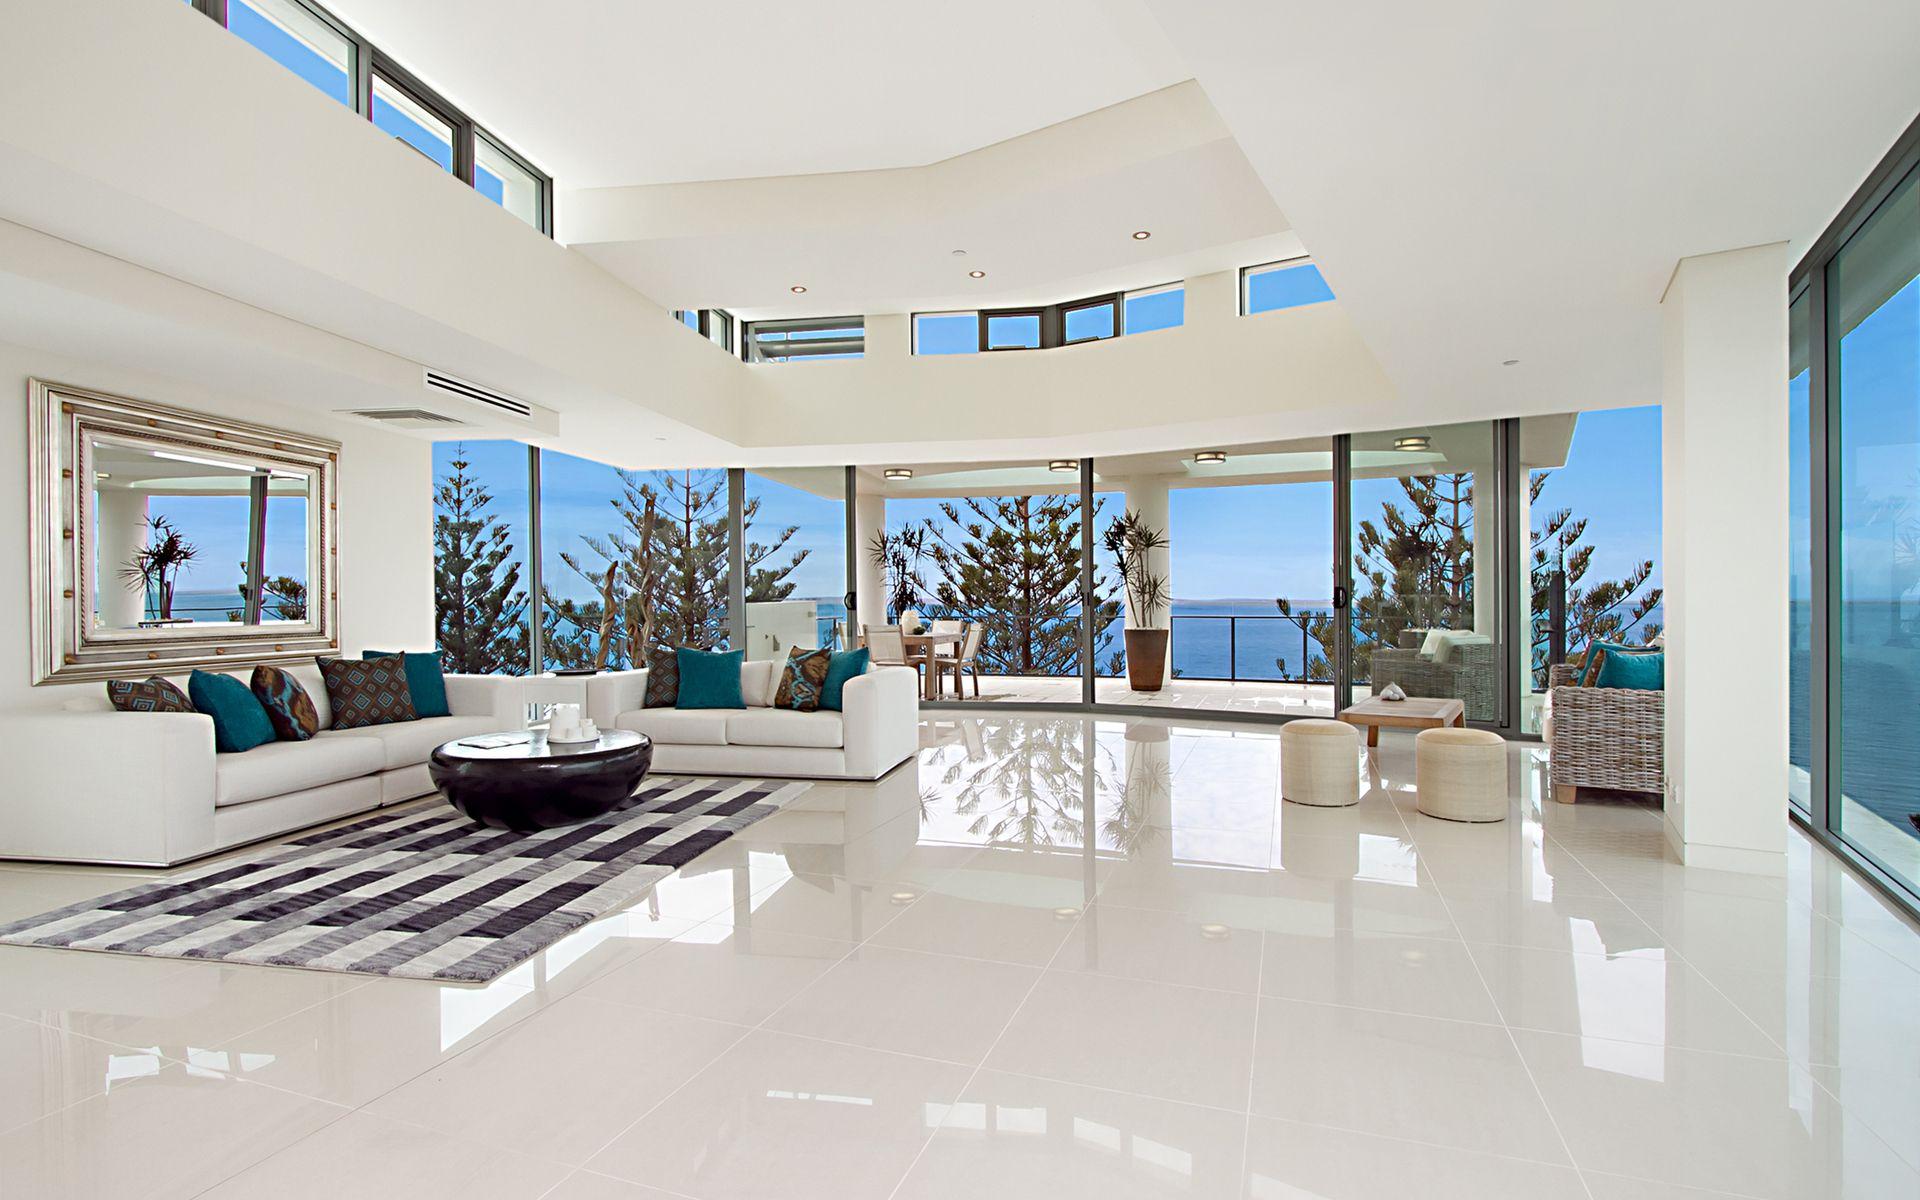 Luxury modern living room furniture - Luxury Room View Modern Wallpaper Id 1146519 Desktop Nexus Architecture